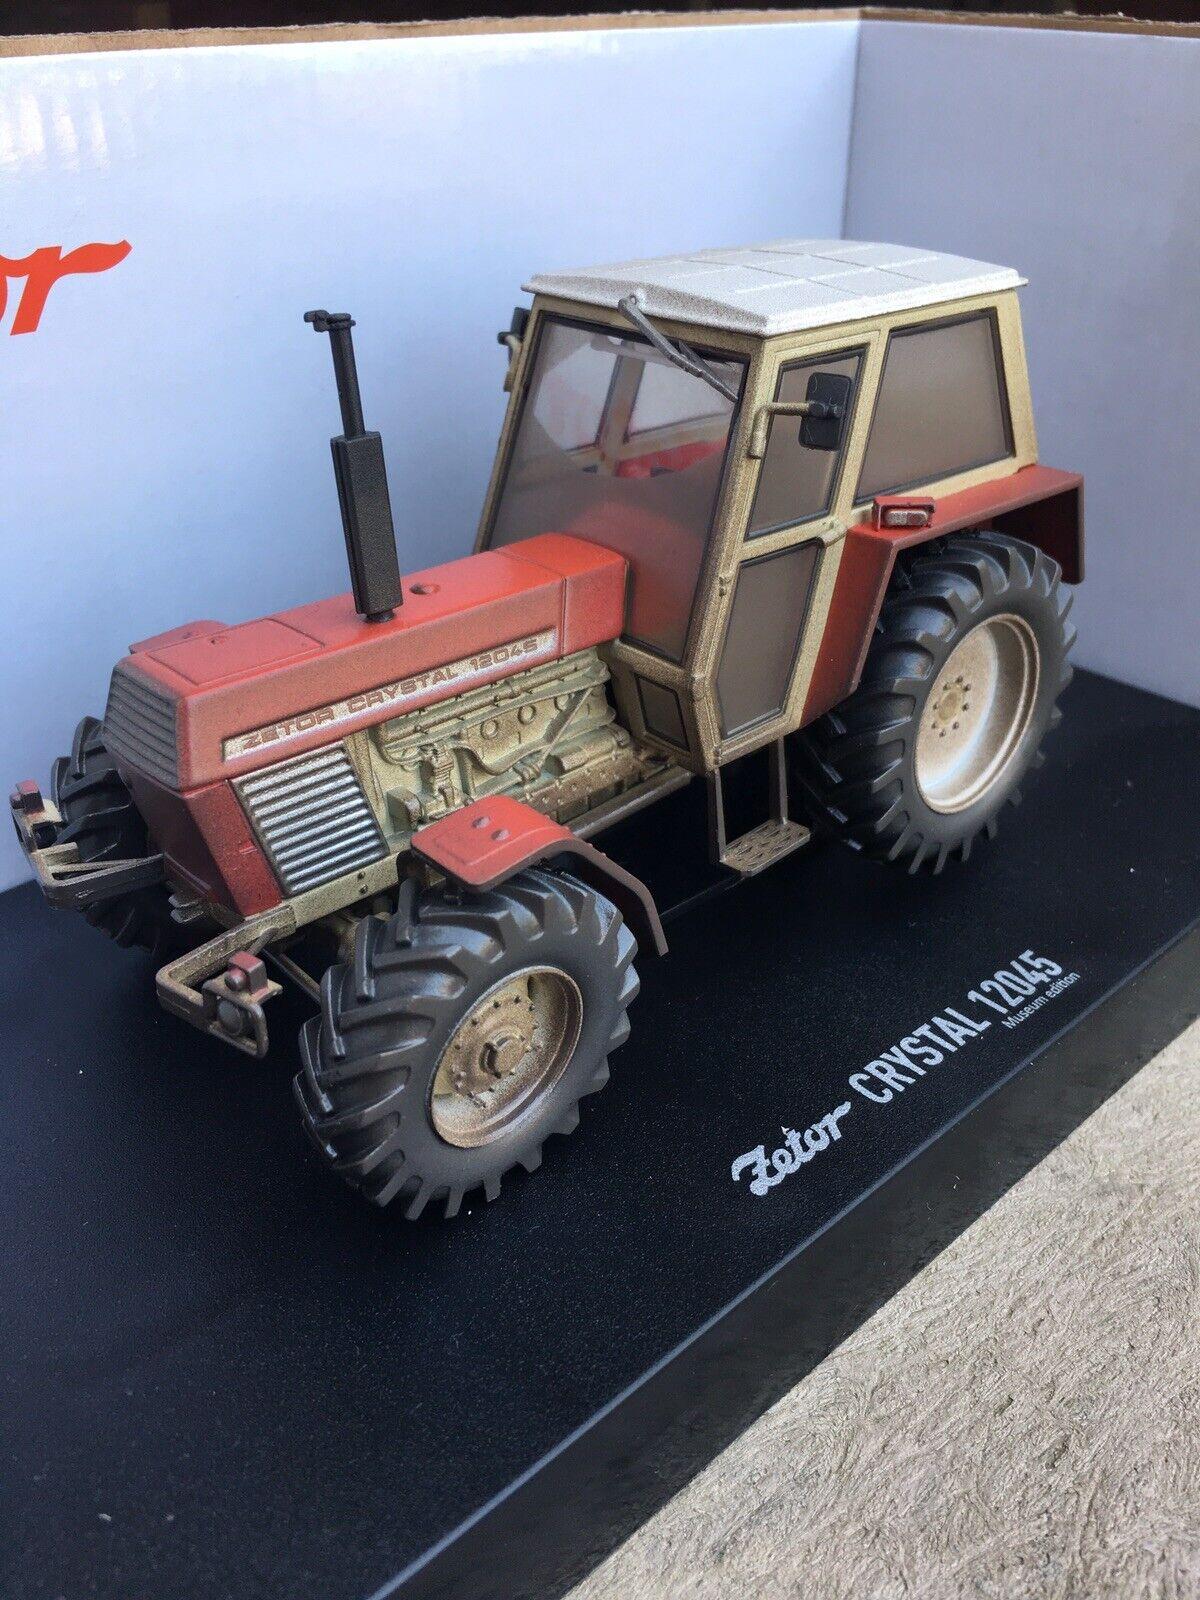 Dusty Weathered Universal Hobbies Zetor Crystal 12045 Tractor 1 32 Scale TRAKTOR